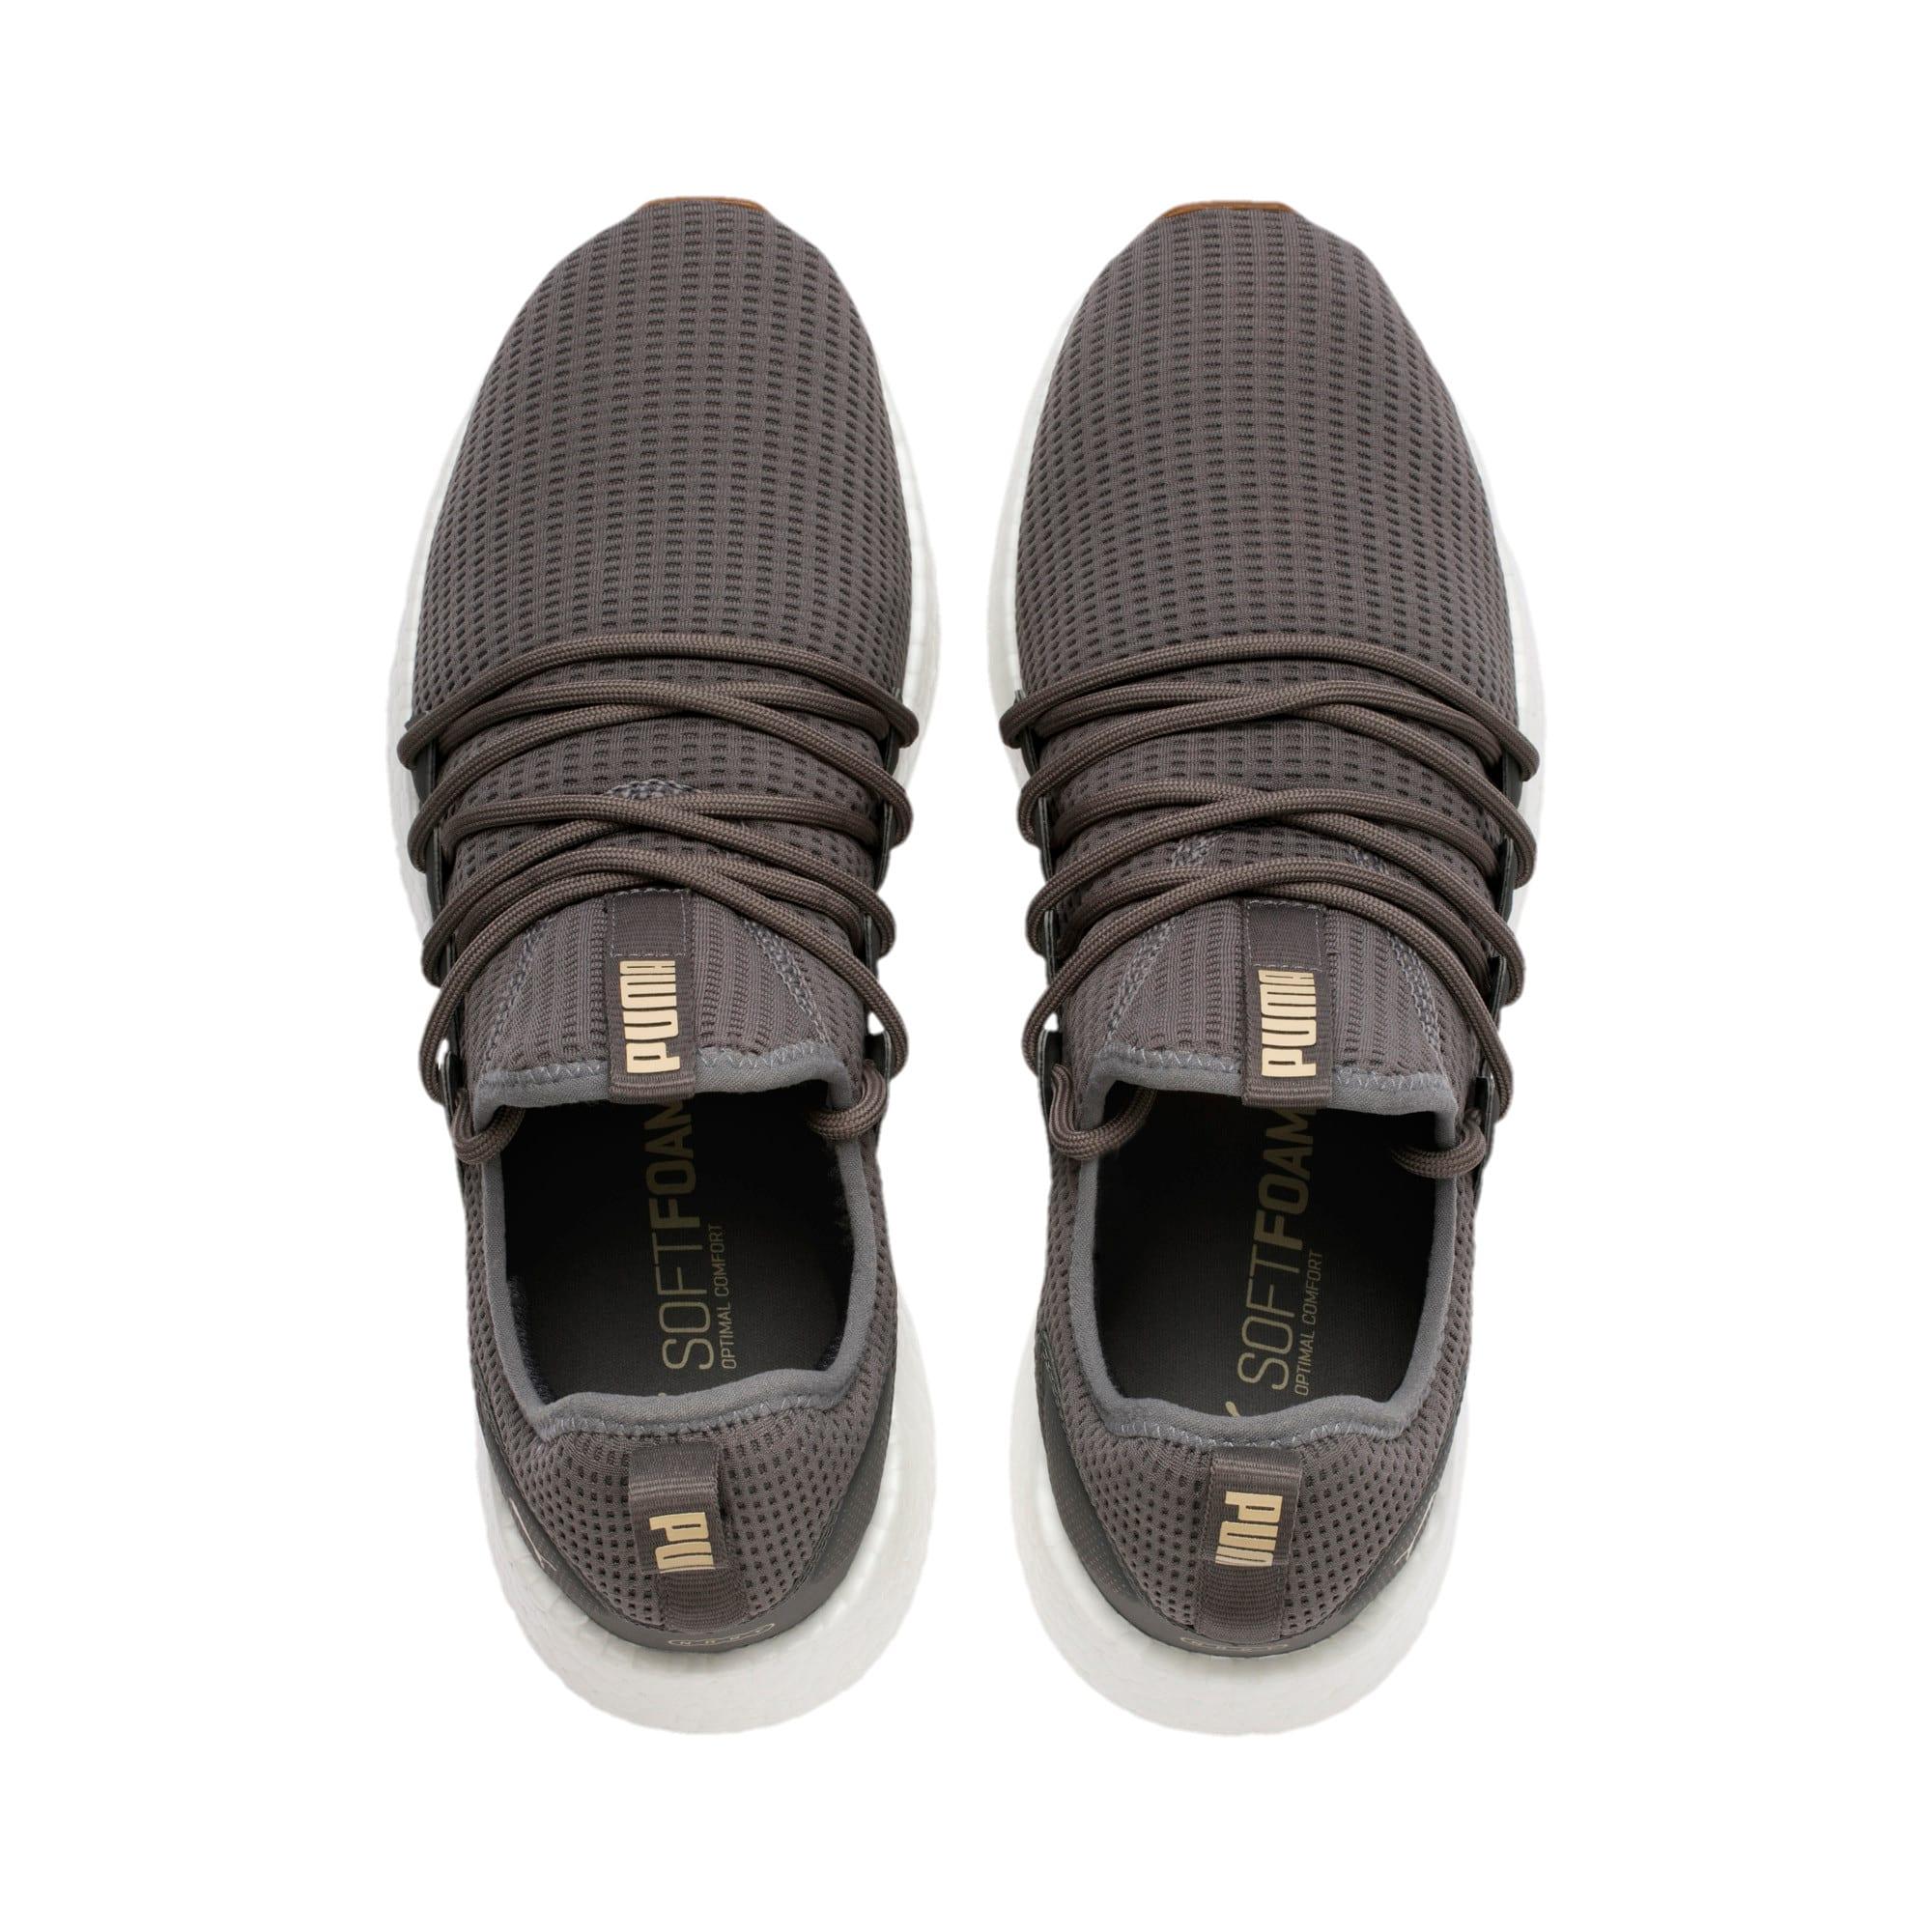 Thumbnail 6 of NRGY Neko Future Men's Running Shoes, Charcoal Gray-Taos Taupe, medium